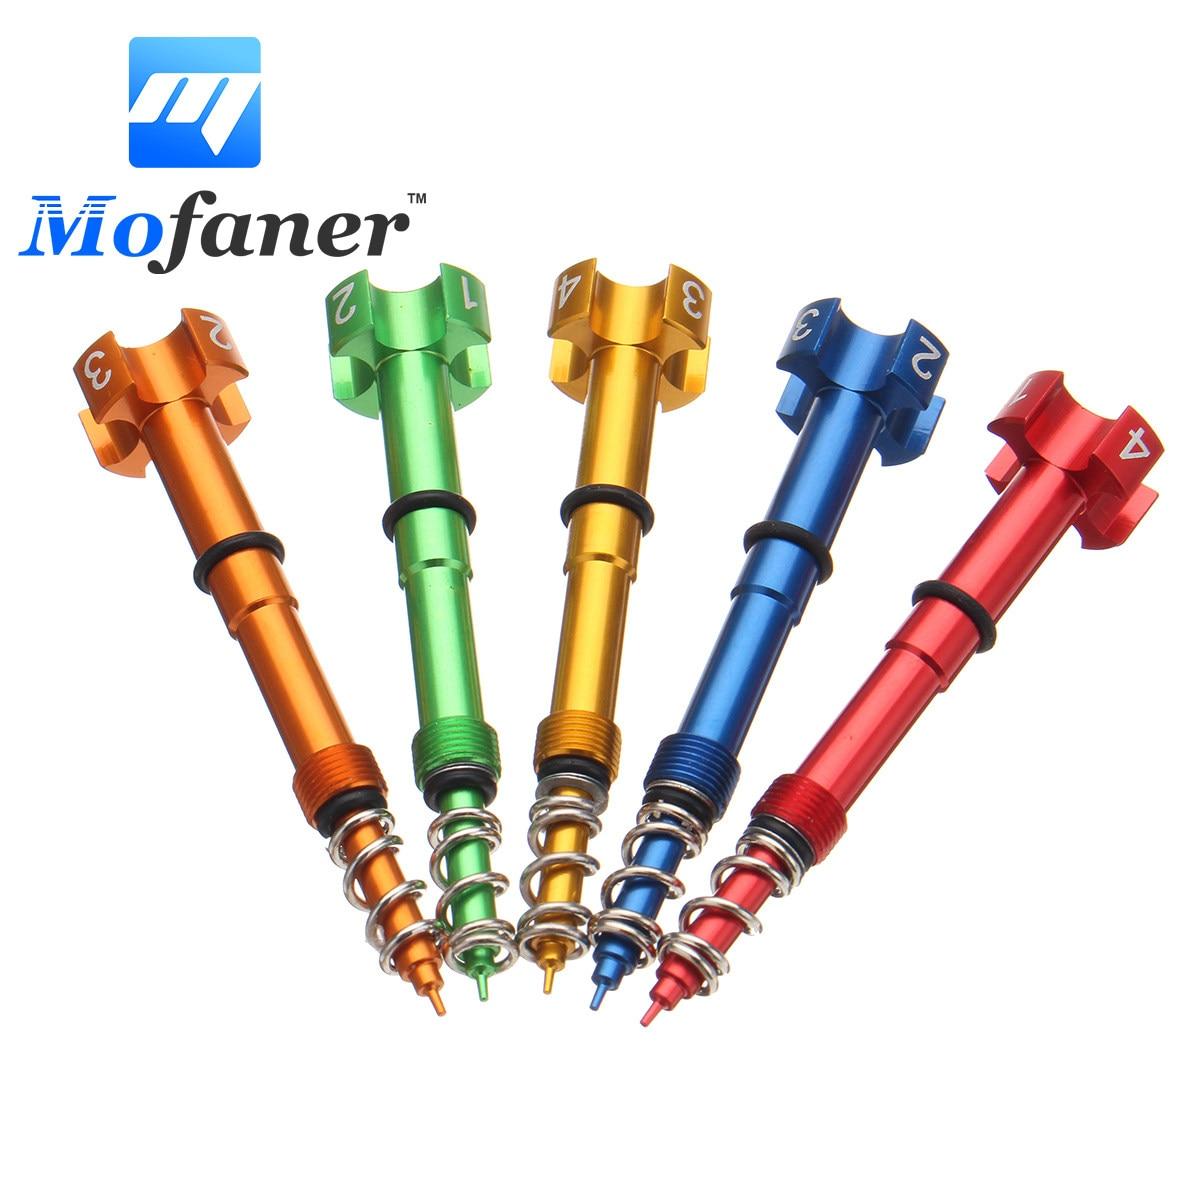 Mofaner Air/Fuel Mixture Screw For Keihin FCR Carbs For Honda /Yamaha/Kawasaki/Suzuki/KTM карбюратор keihin 2 в калининграде